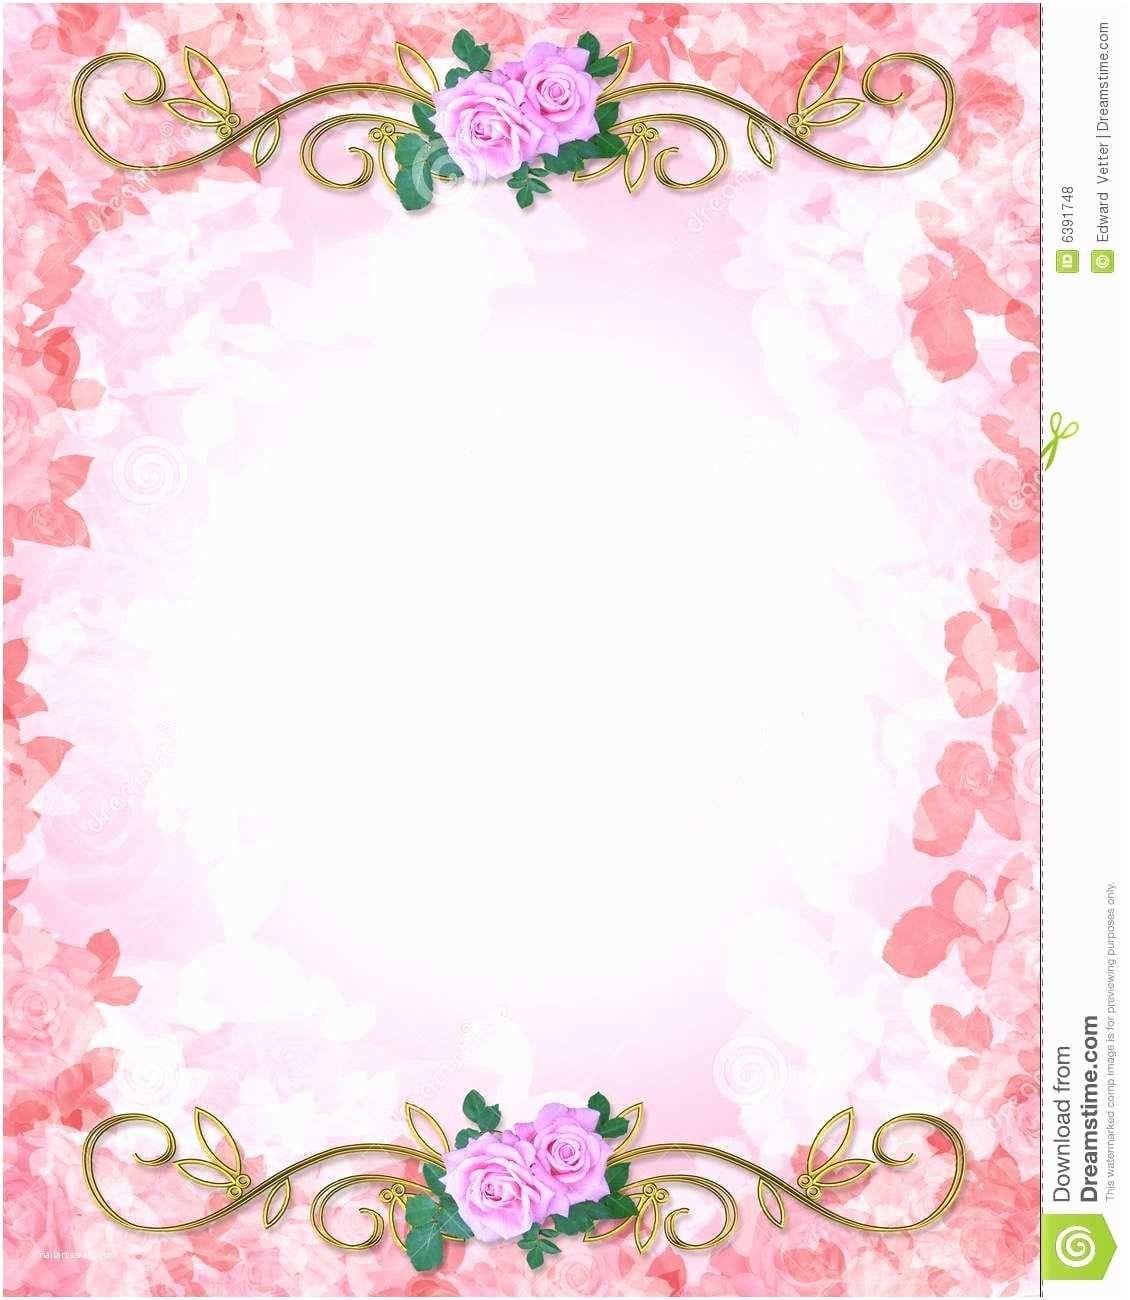 009 Breathtaking Blank Wedding Invitation Template Concept  Templates Free Download Printable Royal BlueFull